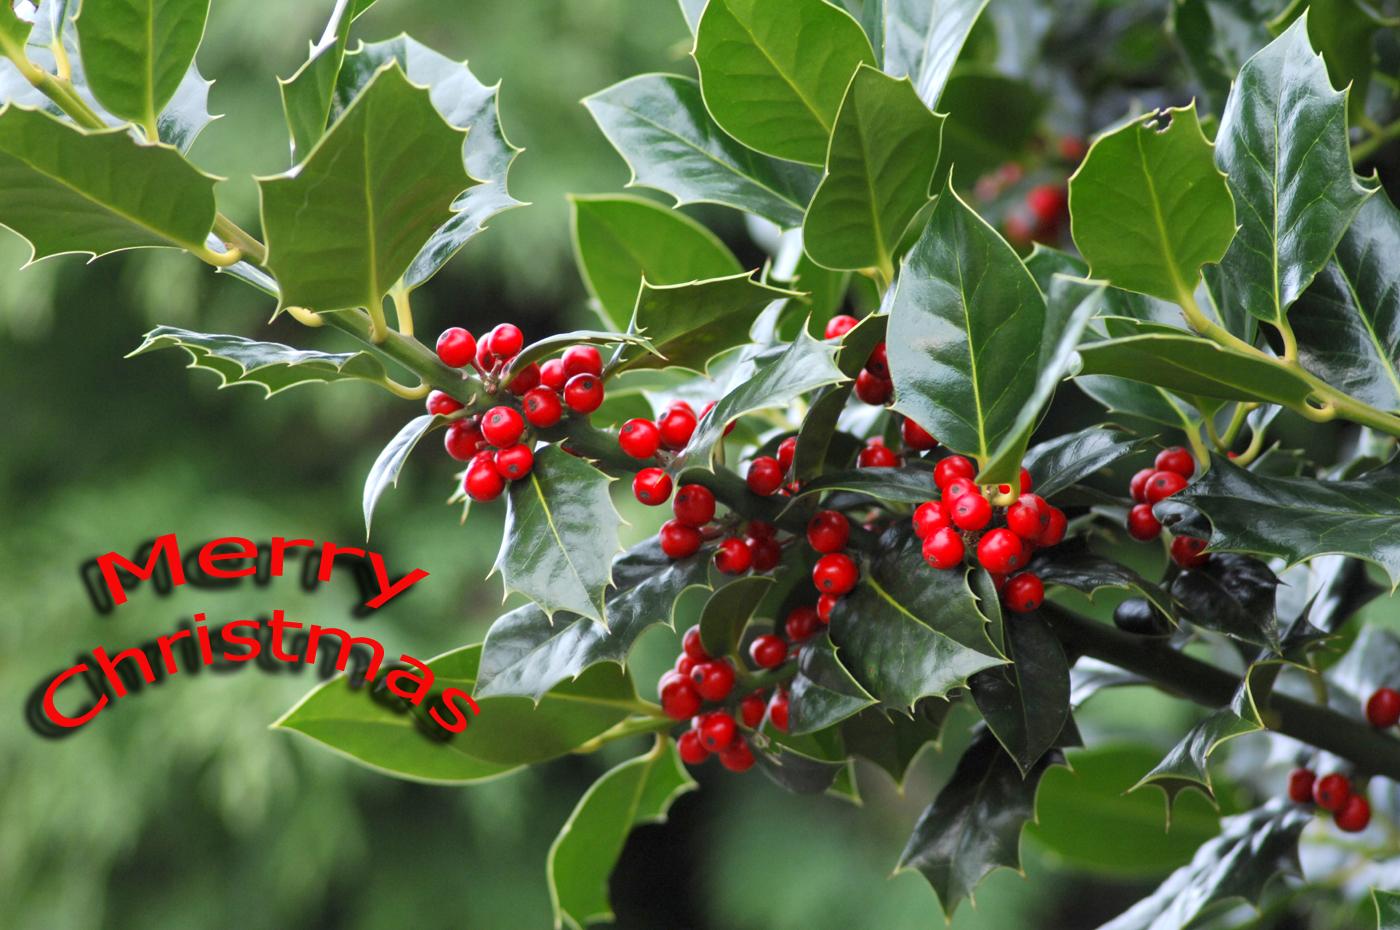 http://4.bp.blogspot.com/_7F-jRfYZc6A/R1LuKZgKPAI/AAAAAAAABjs/x2Dfj8UE5Cw/s1600-R/Happy+Christmas.jpg